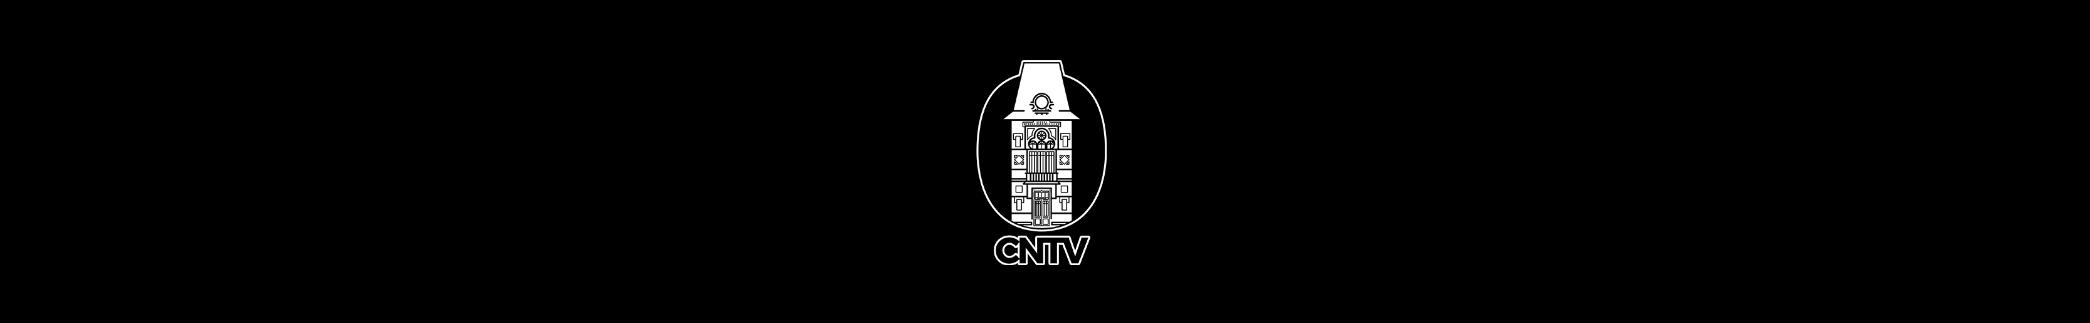 "Colegiul Național ""Tudor Vladimirescu"" Târgu Jiu"